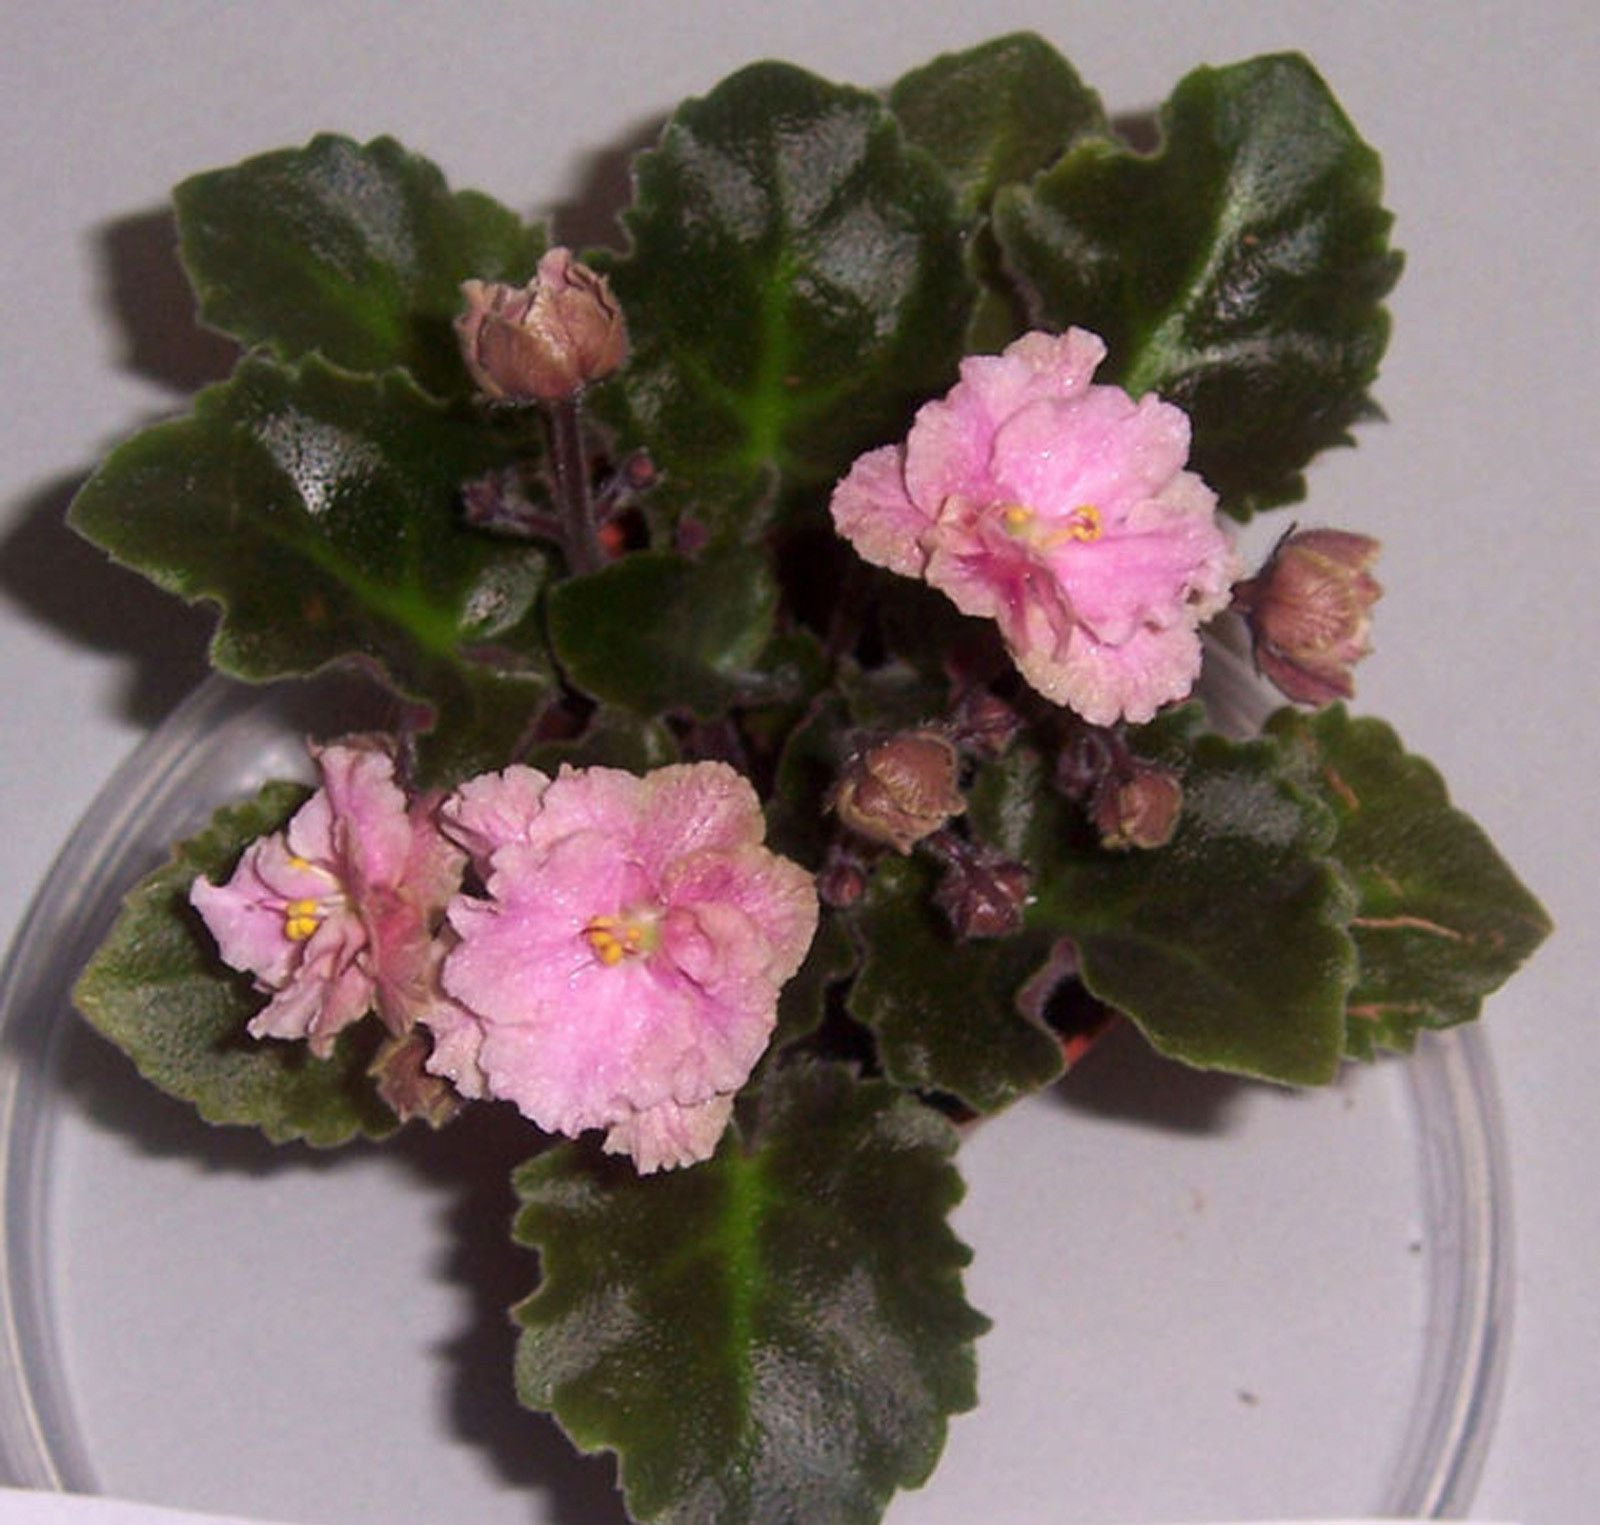 african violet rob 39 s antique rose semi miniature plant in pot african violets pinterest. Black Bedroom Furniture Sets. Home Design Ideas